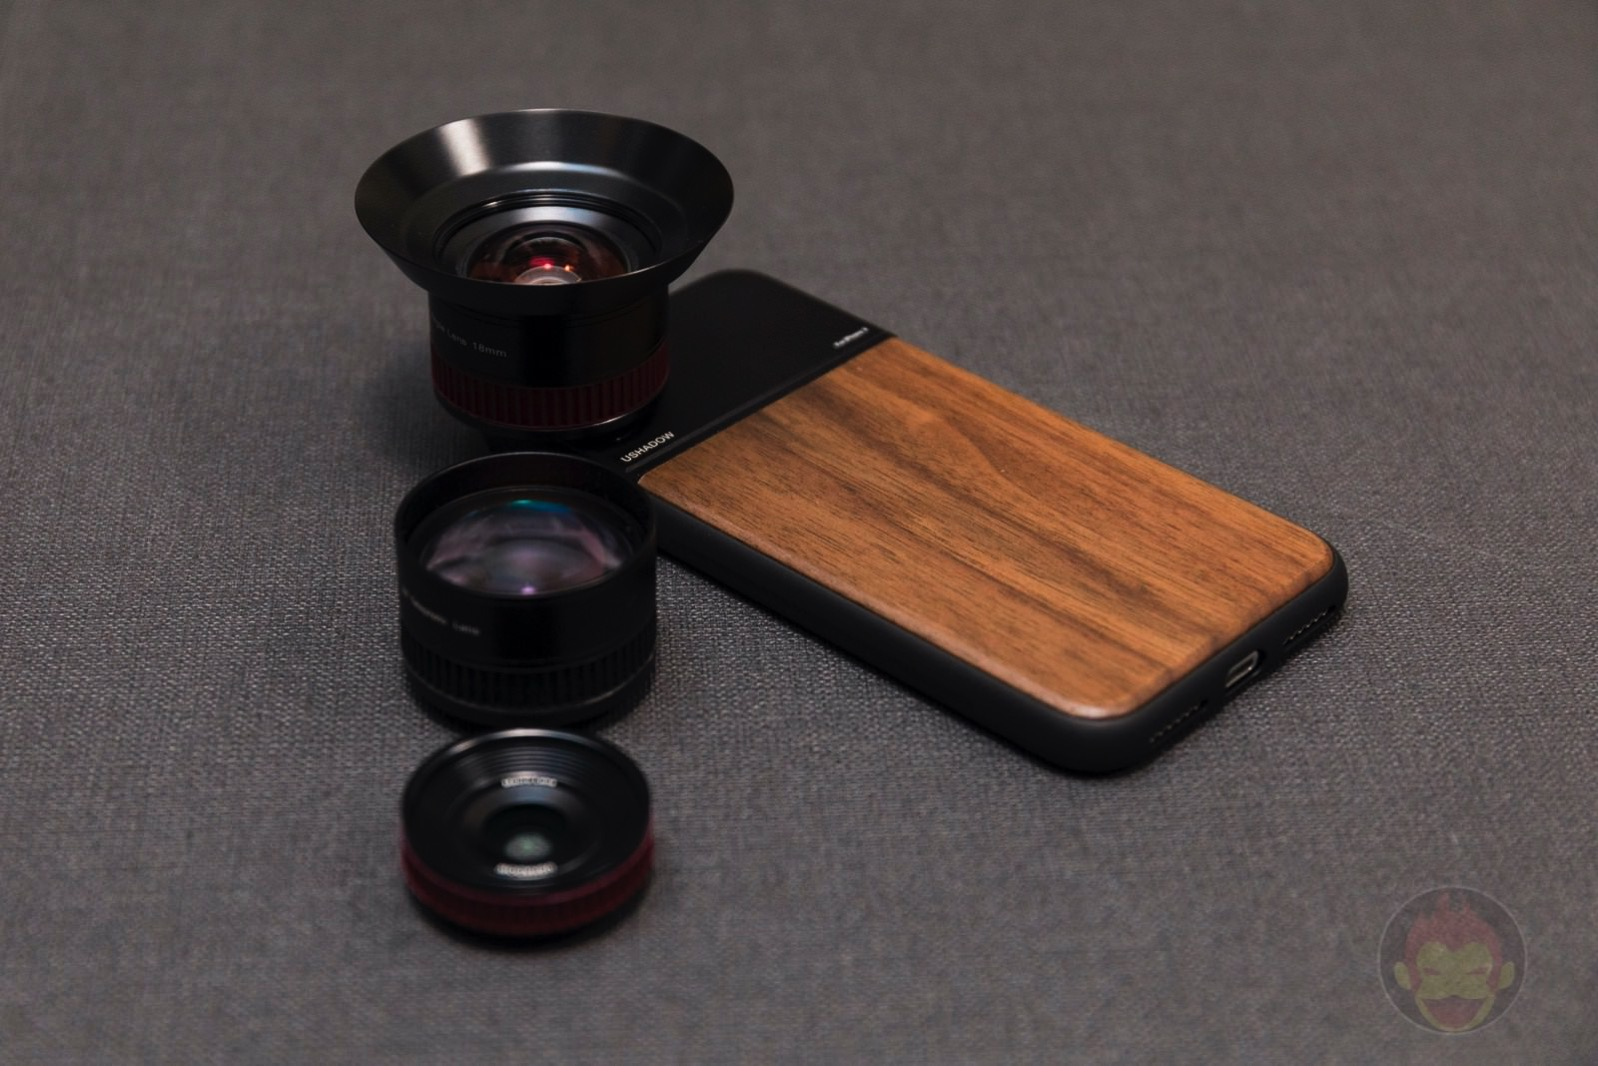 USHADOW-X1-Lens-System-Review-24.jpg